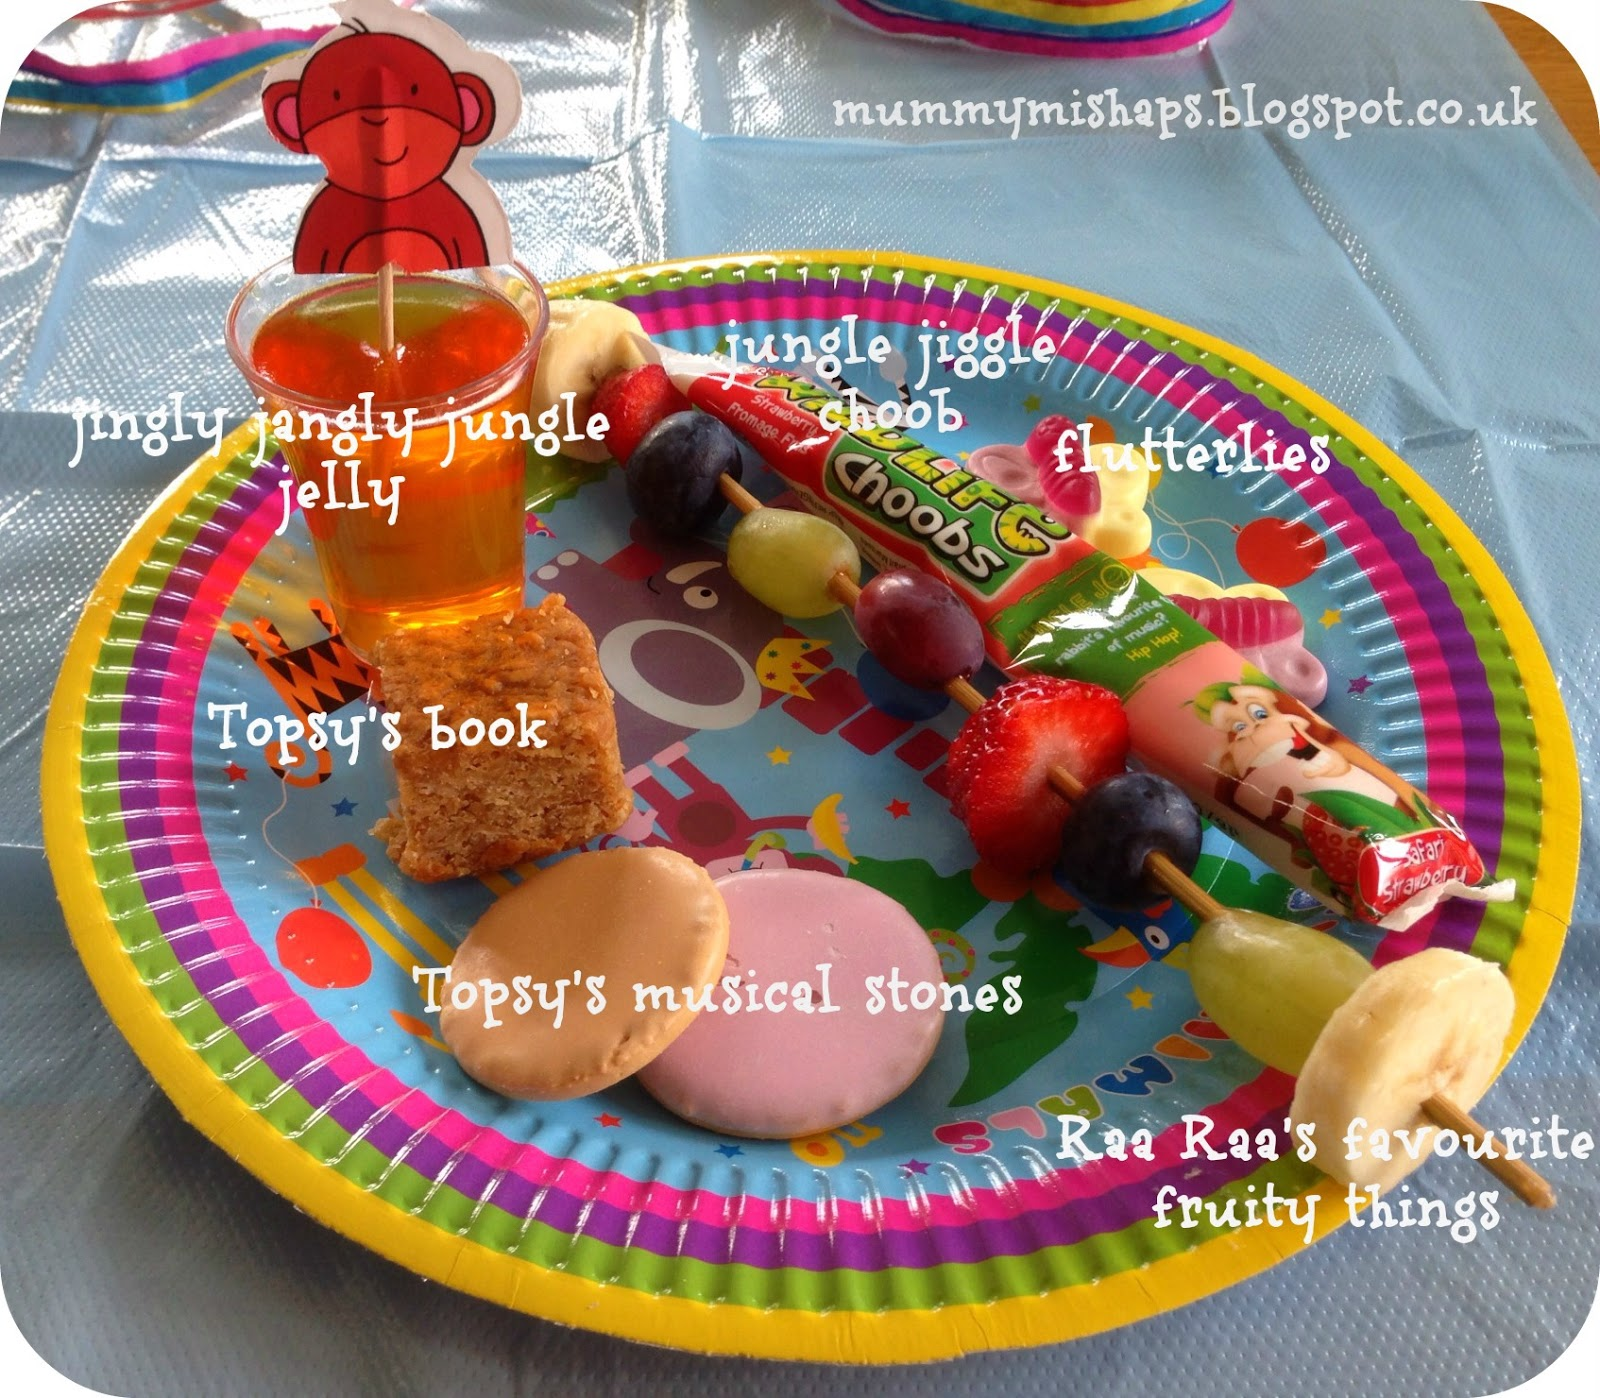 http://1.bp.blogspot.com/-SgEMdX8qwxw/UVn0f6P44YI/AAAAAAAASAg/B5tnZBLAc10/s1600/desseerrt.jpg